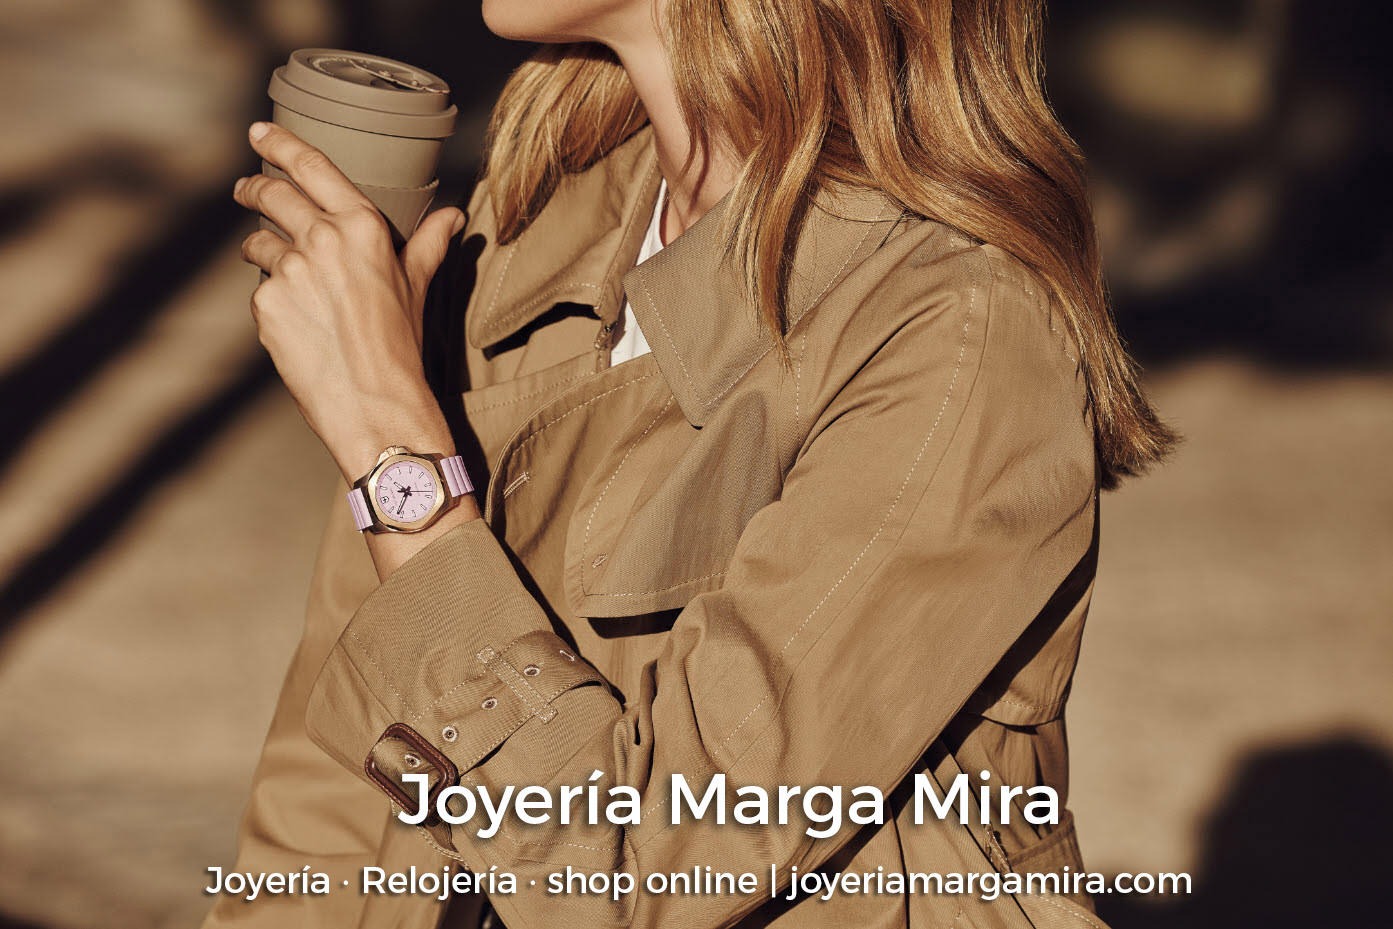 comprar Reloj Victorinox I.N.O.X. V V241807 Para Mujer - donde comprar relojes mujer alicante - tienda relojes online alicante - mejor precios relojes mujer victorinox online - relojerias alicante - joyeria marga mira - joyerias alicante capital